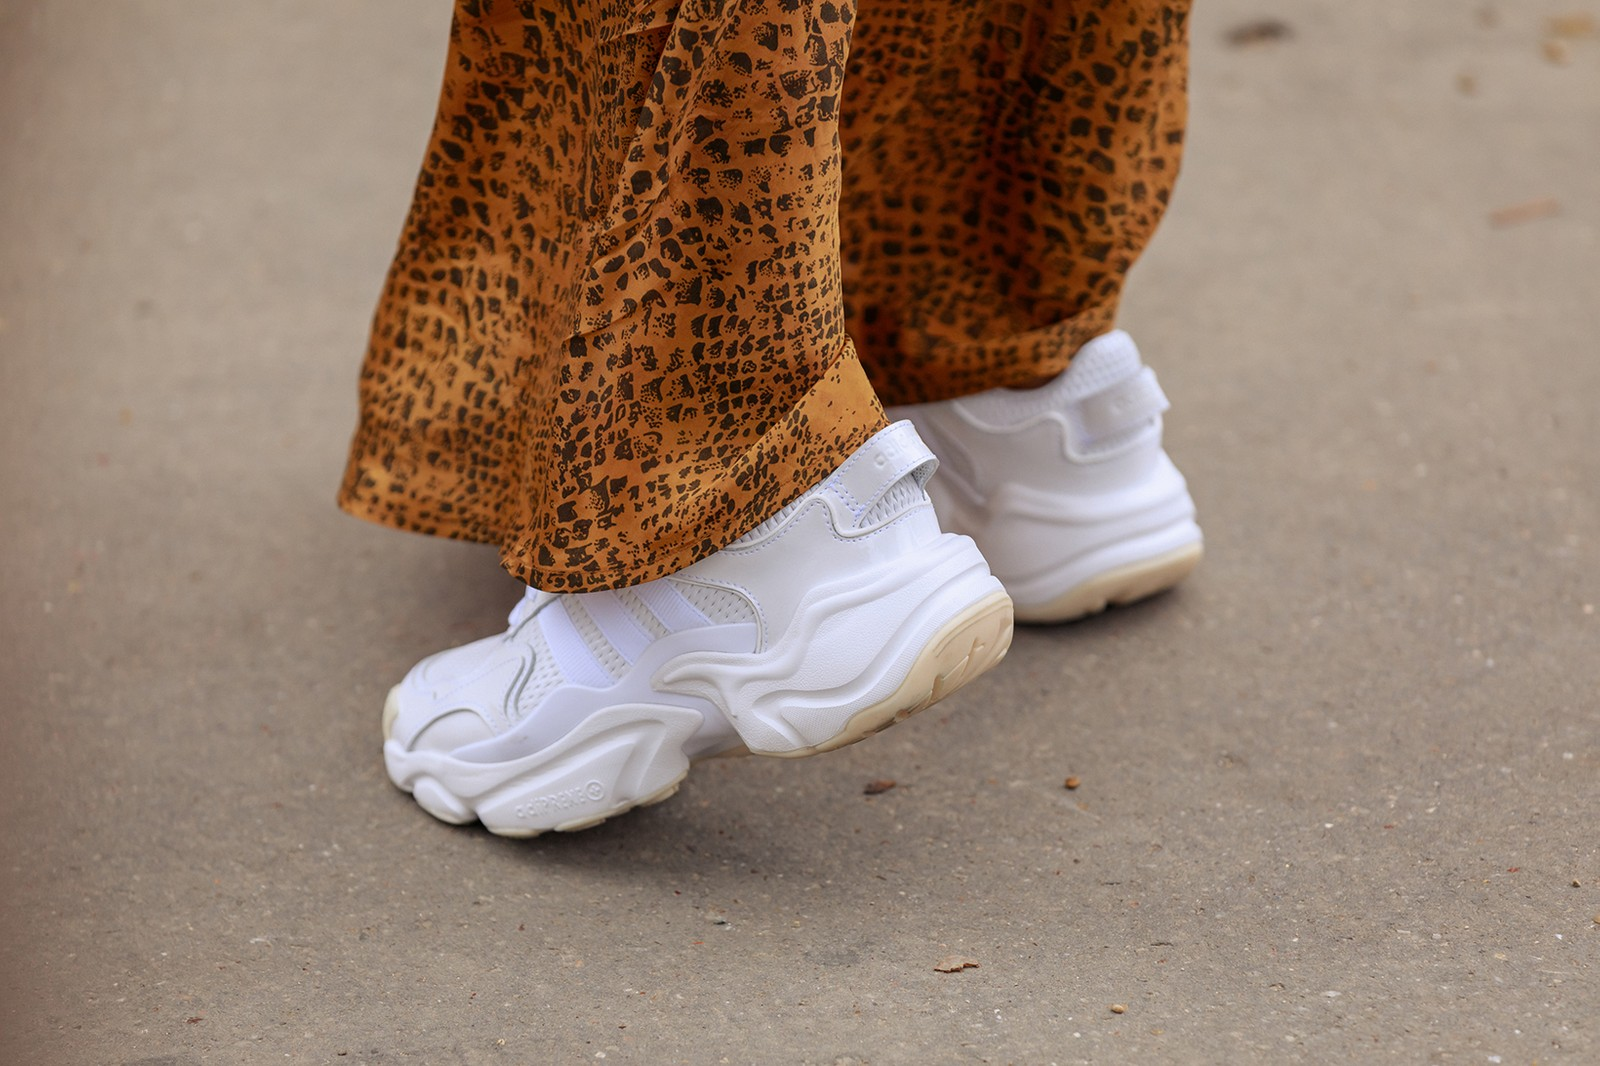 Best Street Style Sneakers Paris Fashion Week SS20 Nike sacai LDWaffle Daybreak Asics Kiko Kostadinov Louis Vuitton Archlight Prada Cloudbust thunder adidas magmur runner